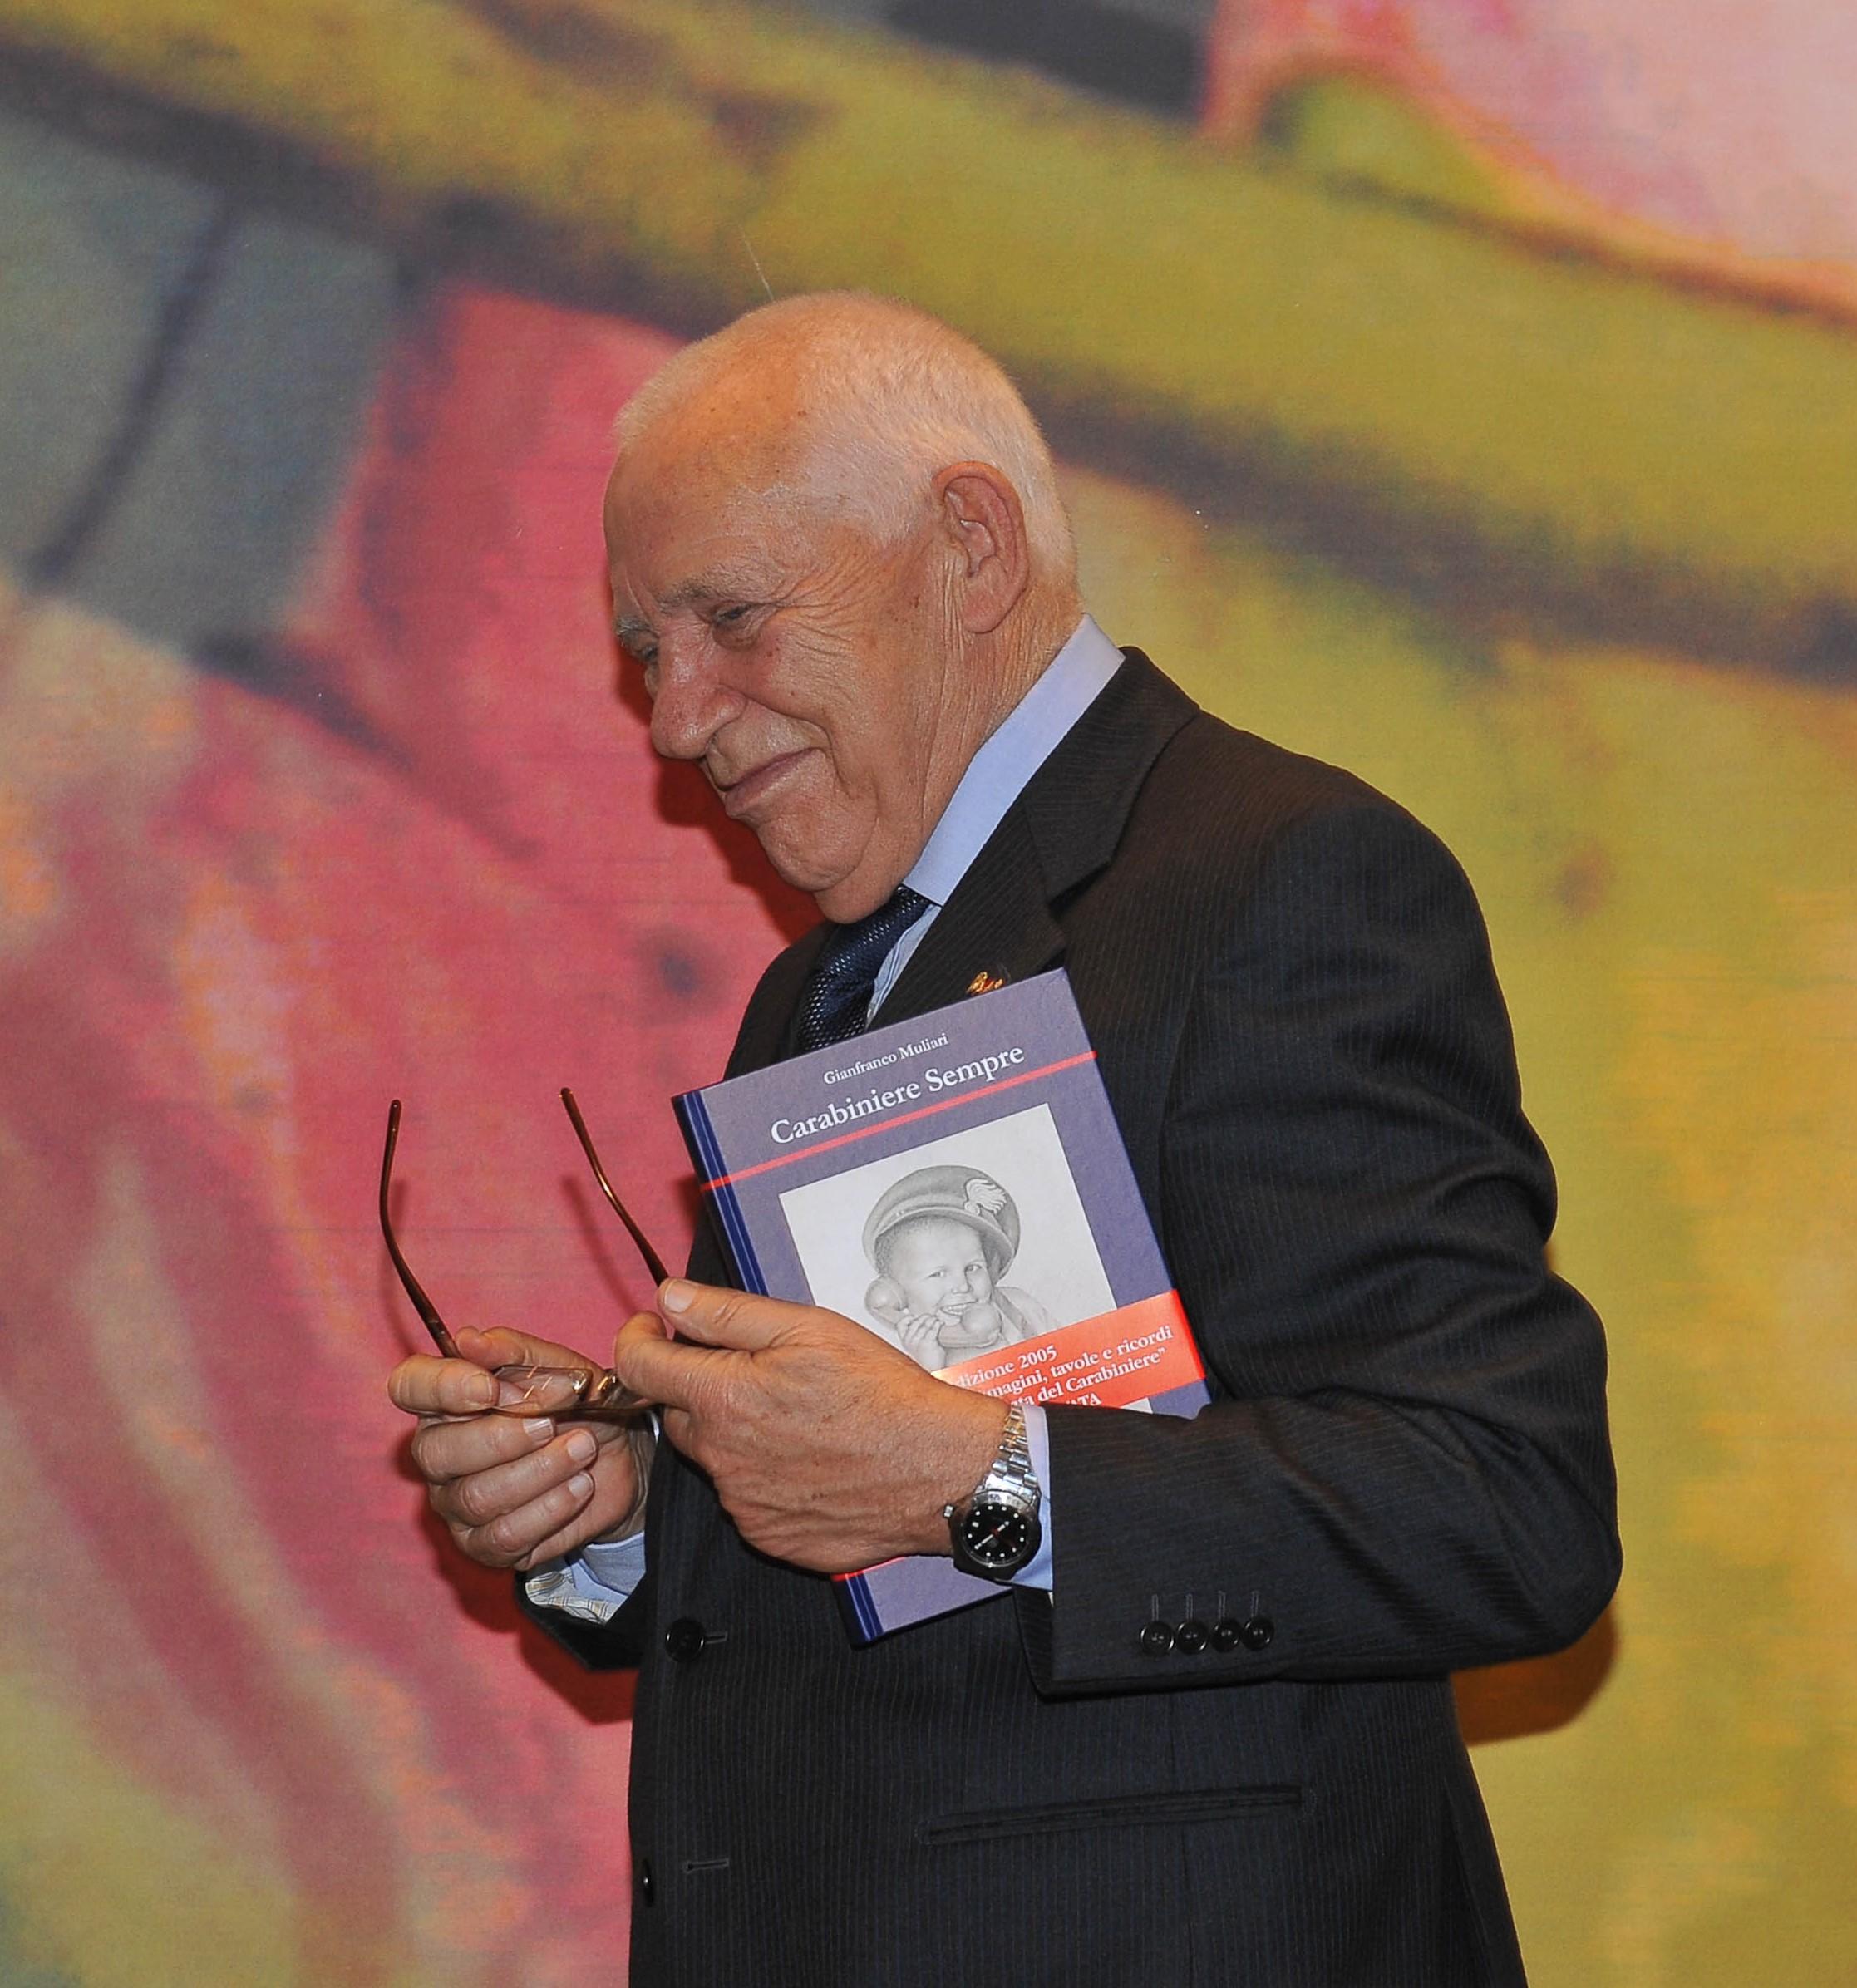 Gianfranco Muliari